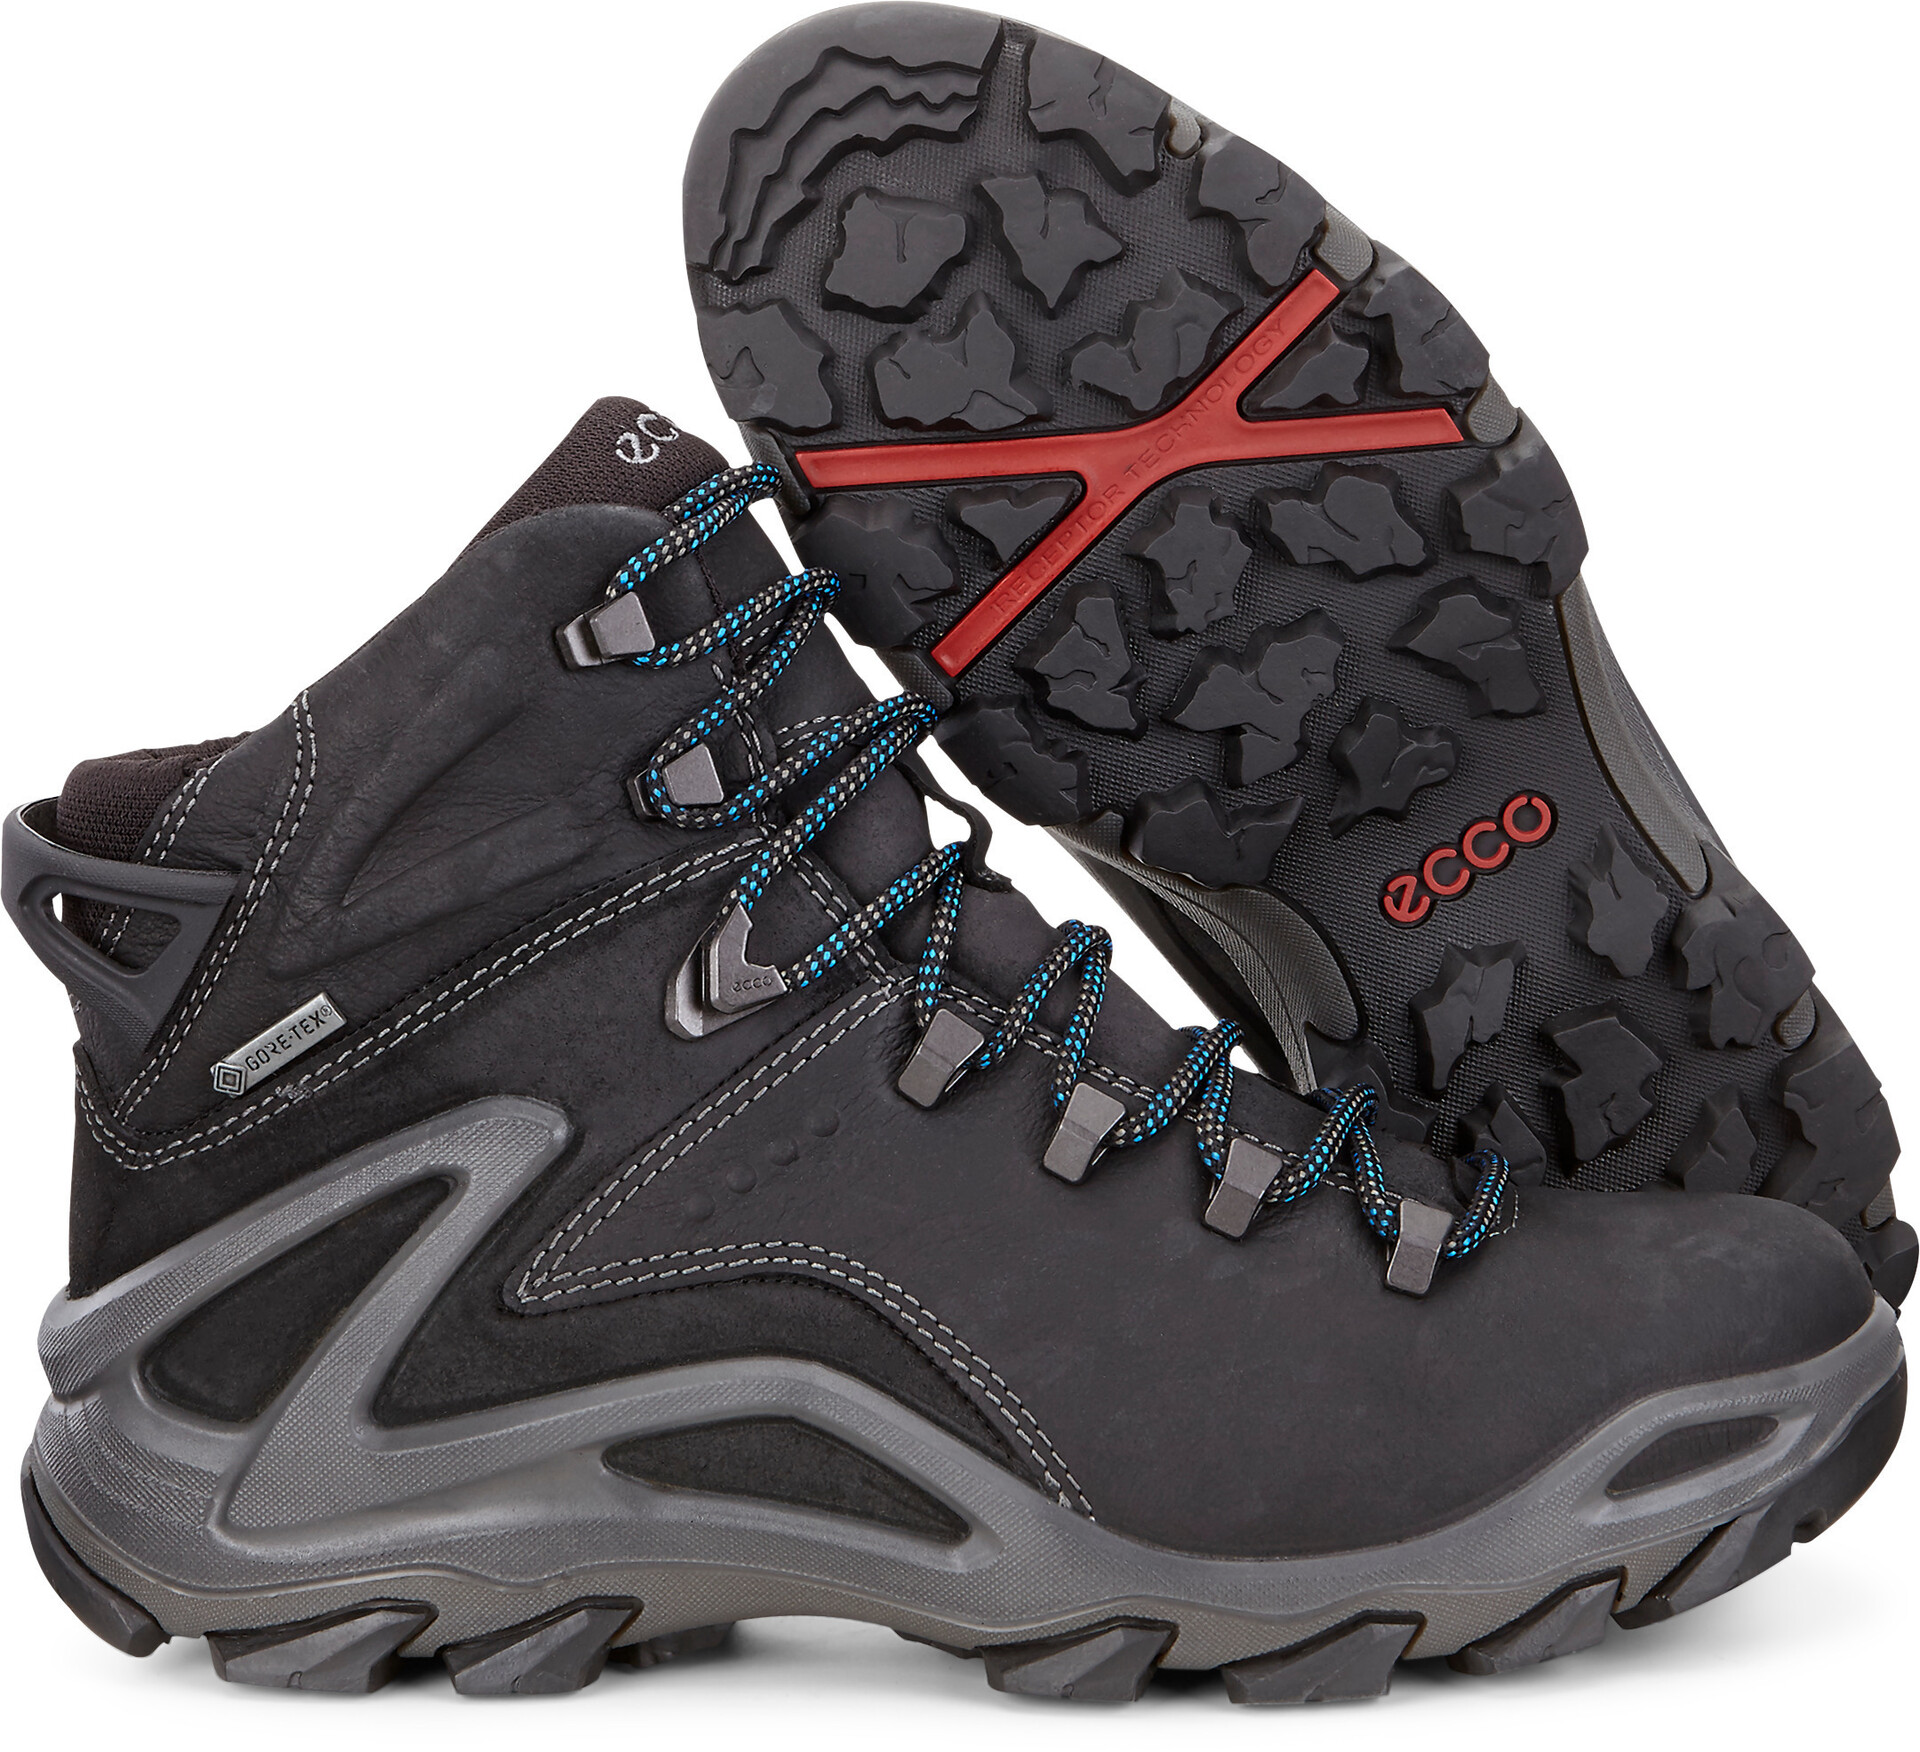 Homme Evo Chaussures Ecco Terra Noir xBdoerCW